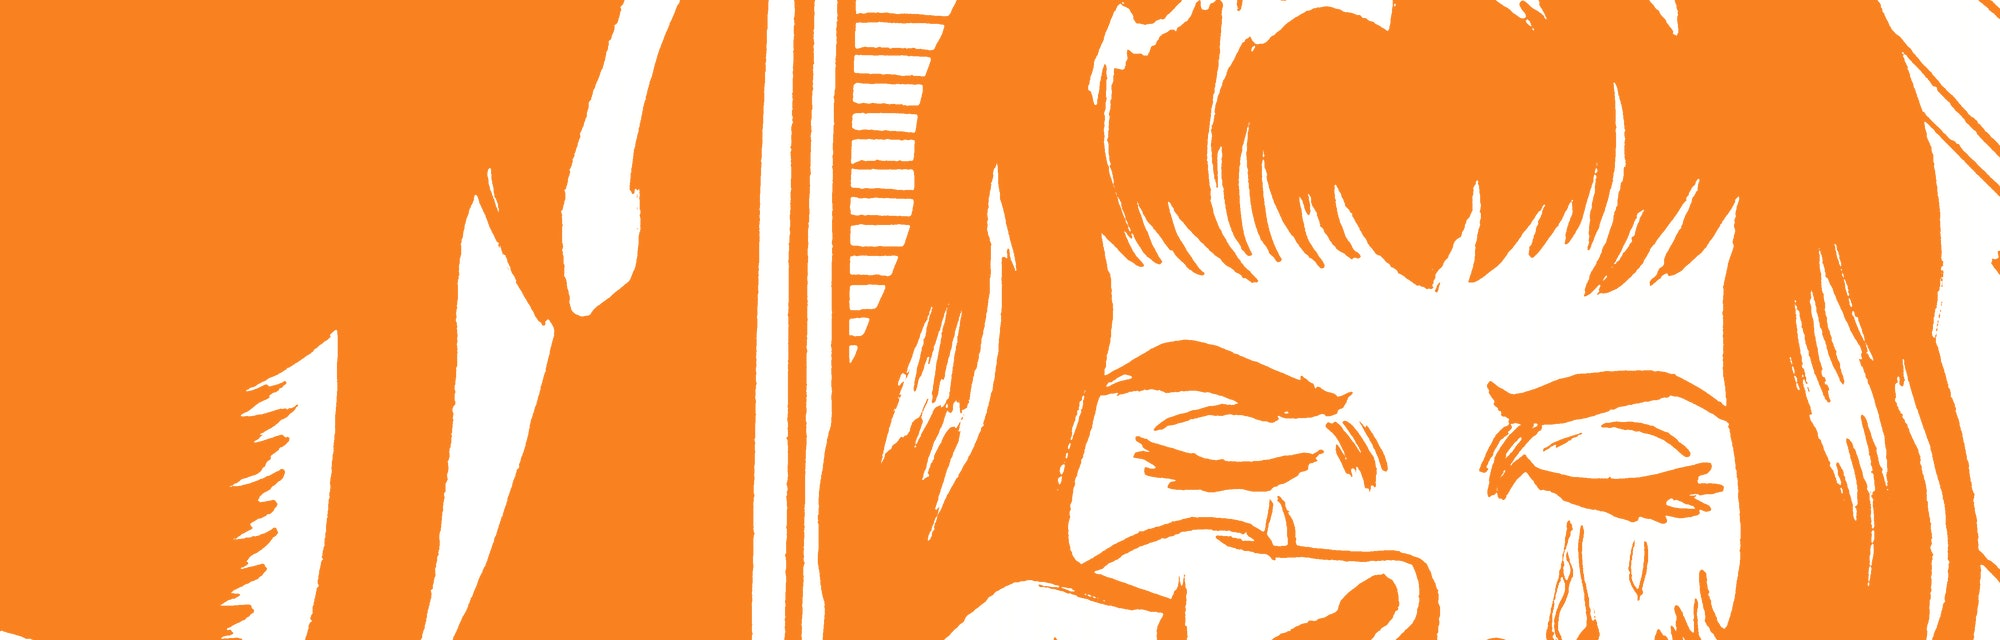 man talking to crying woman illustration